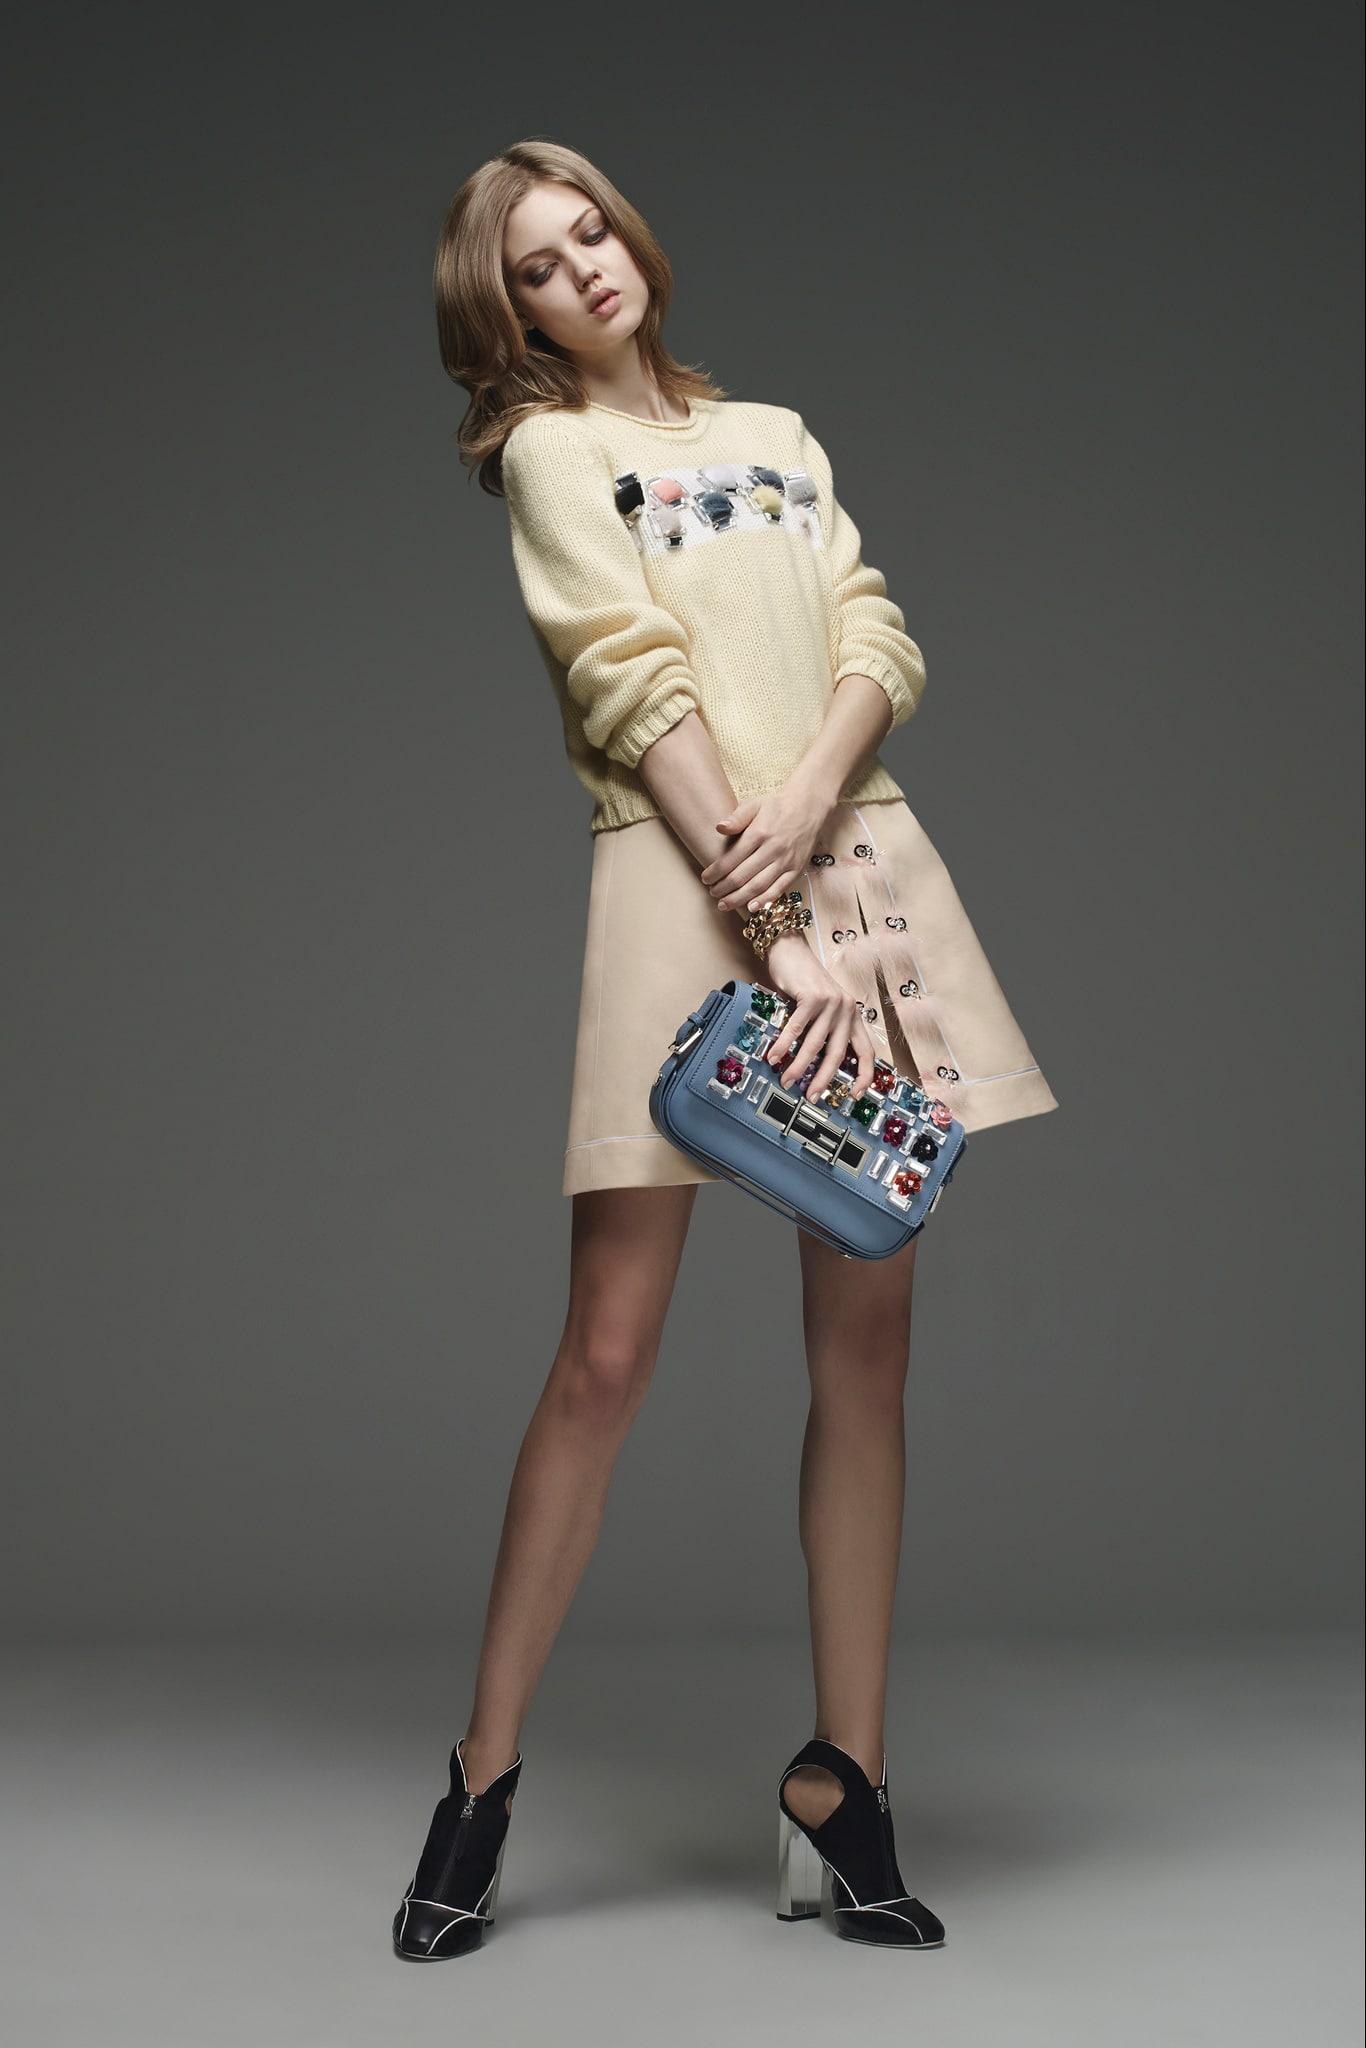 Fendi Pre Fall 2015 Lookbook Collection Spotted Fashion